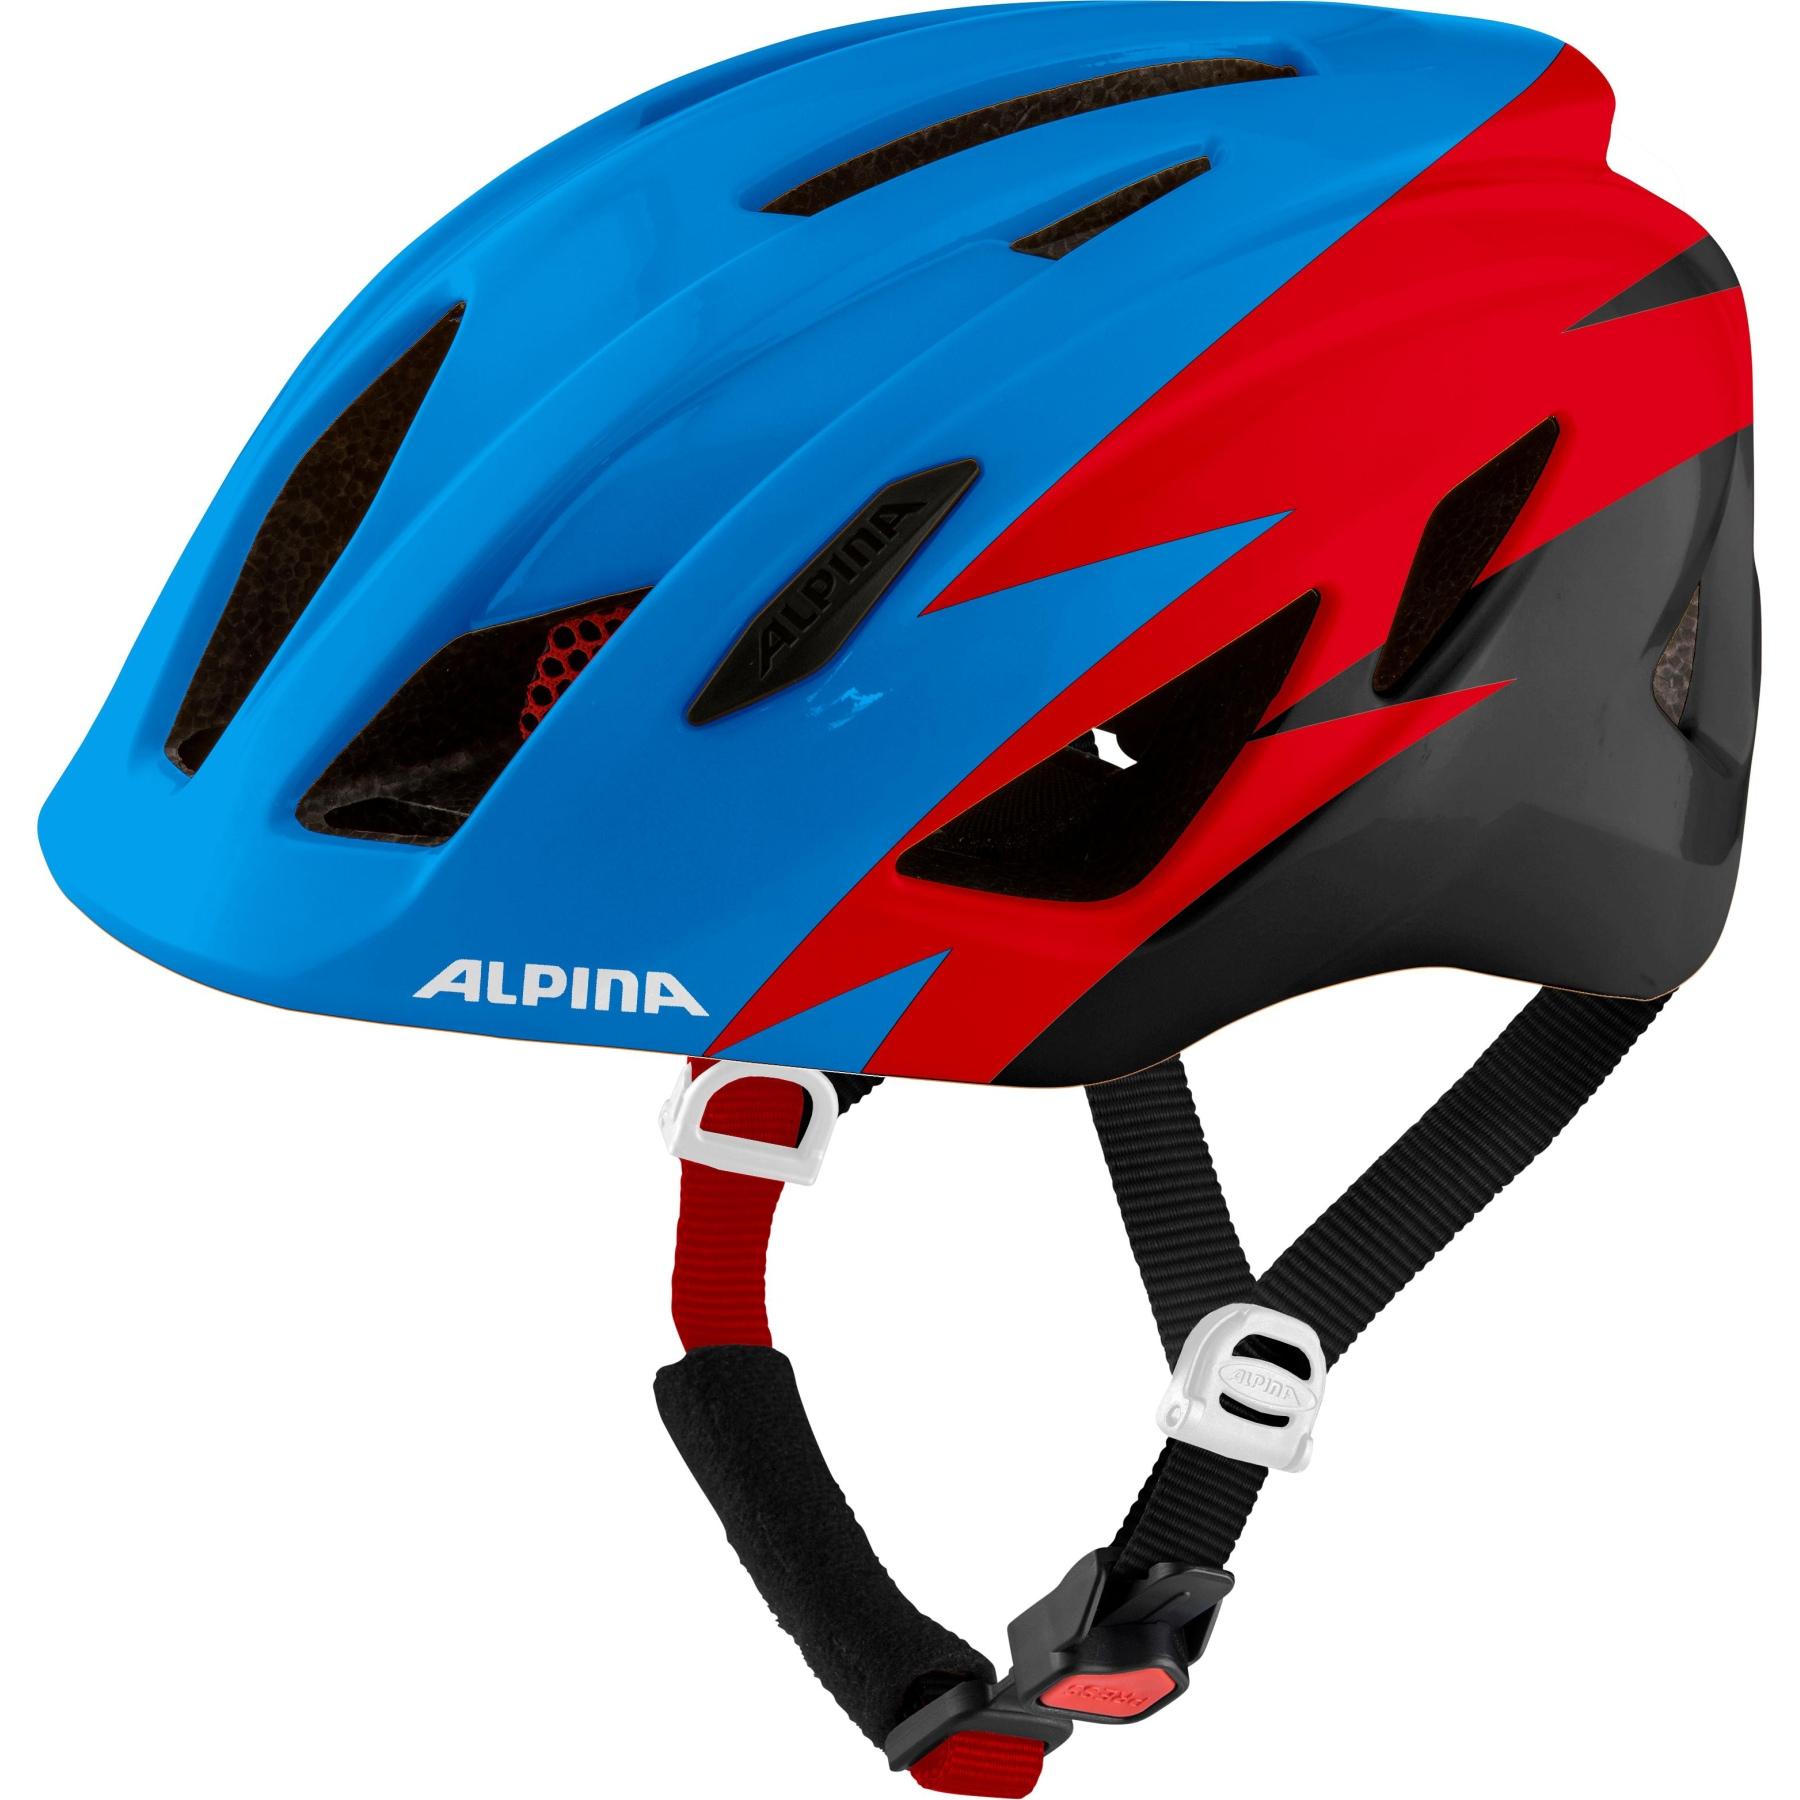 Alpina Pico Kids Helmet - blue-red-black gloss